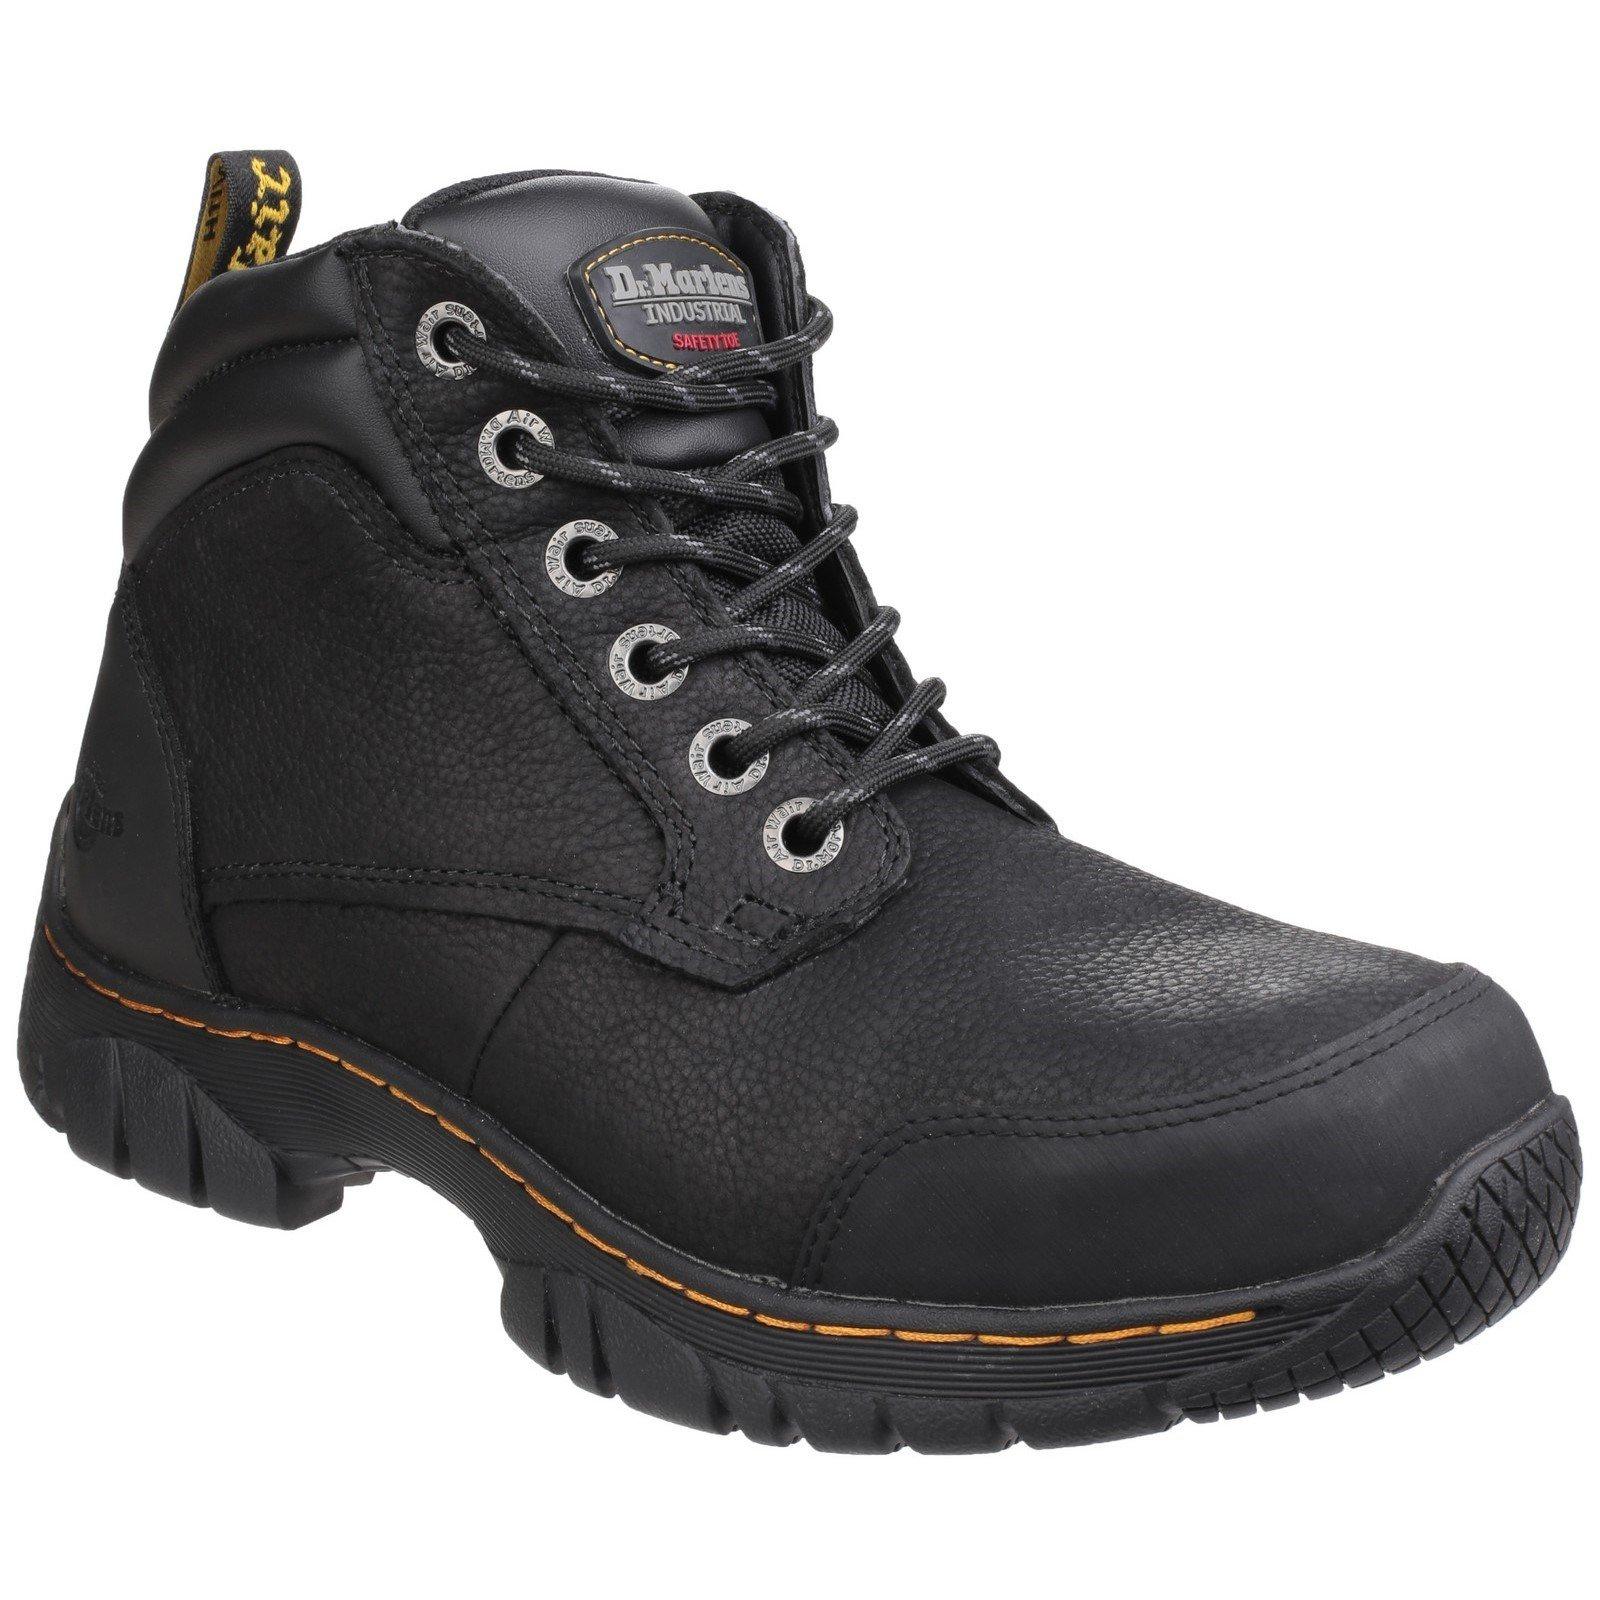 Dr Martens Unisex Riverton SB Lace up Hiker Boot Black 24533 - Black 9